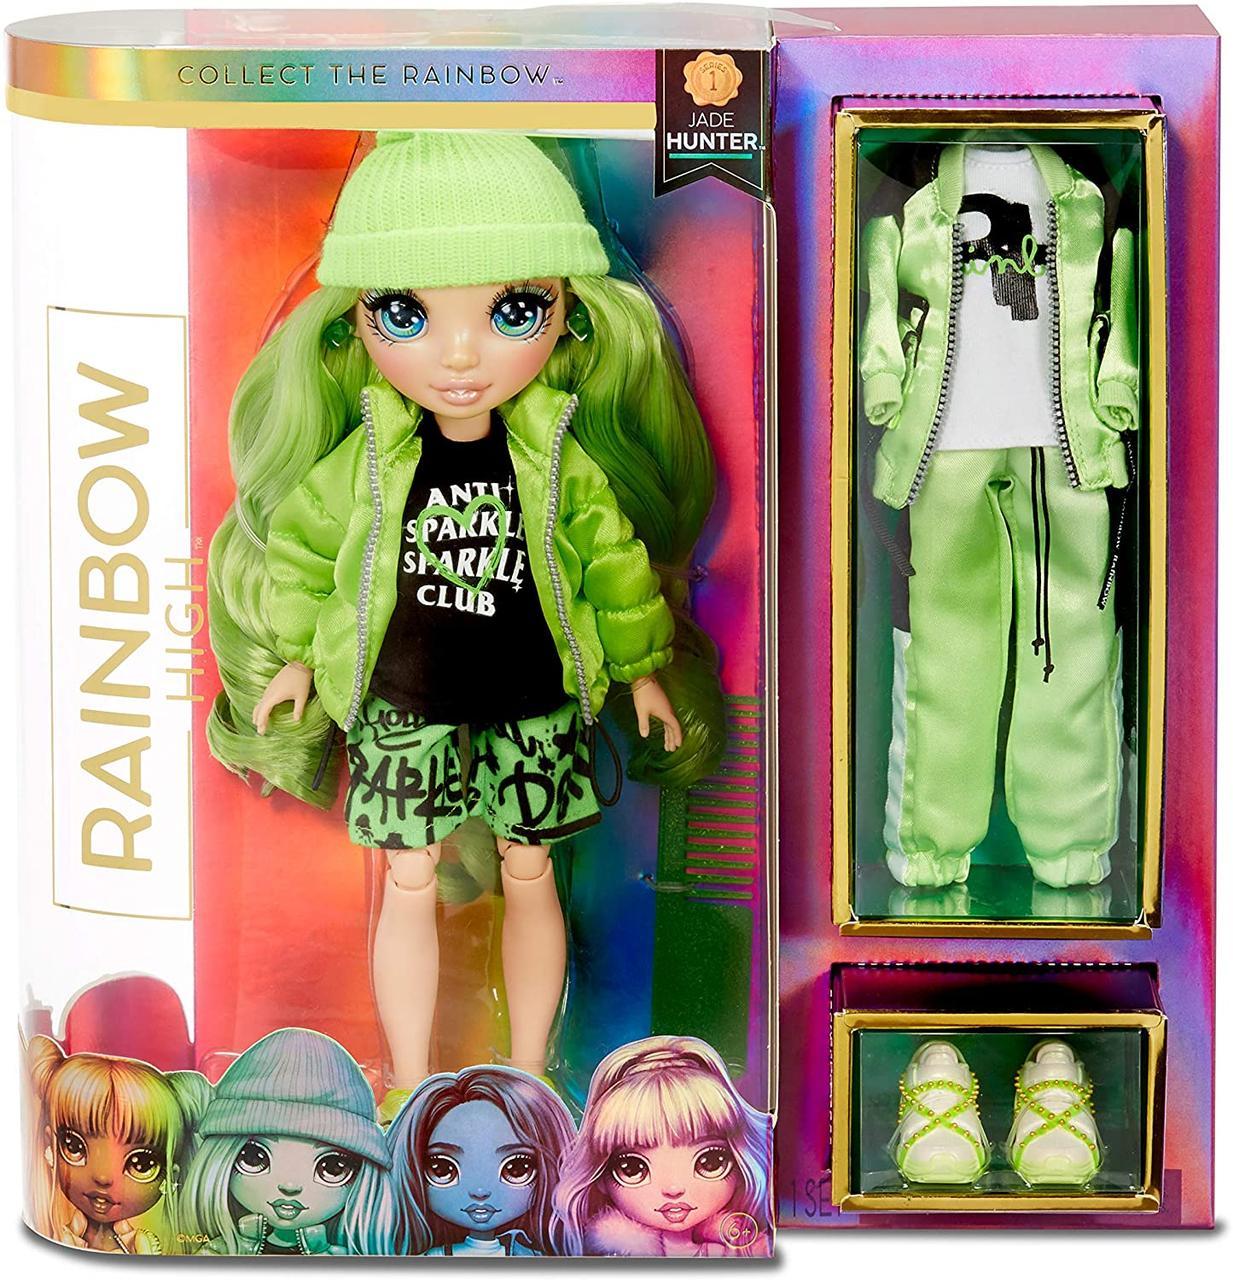 Кукла Рейнбоу Хай Джейд Хантер Rainbow High Jade Hunter Green 569664 Пром-цена